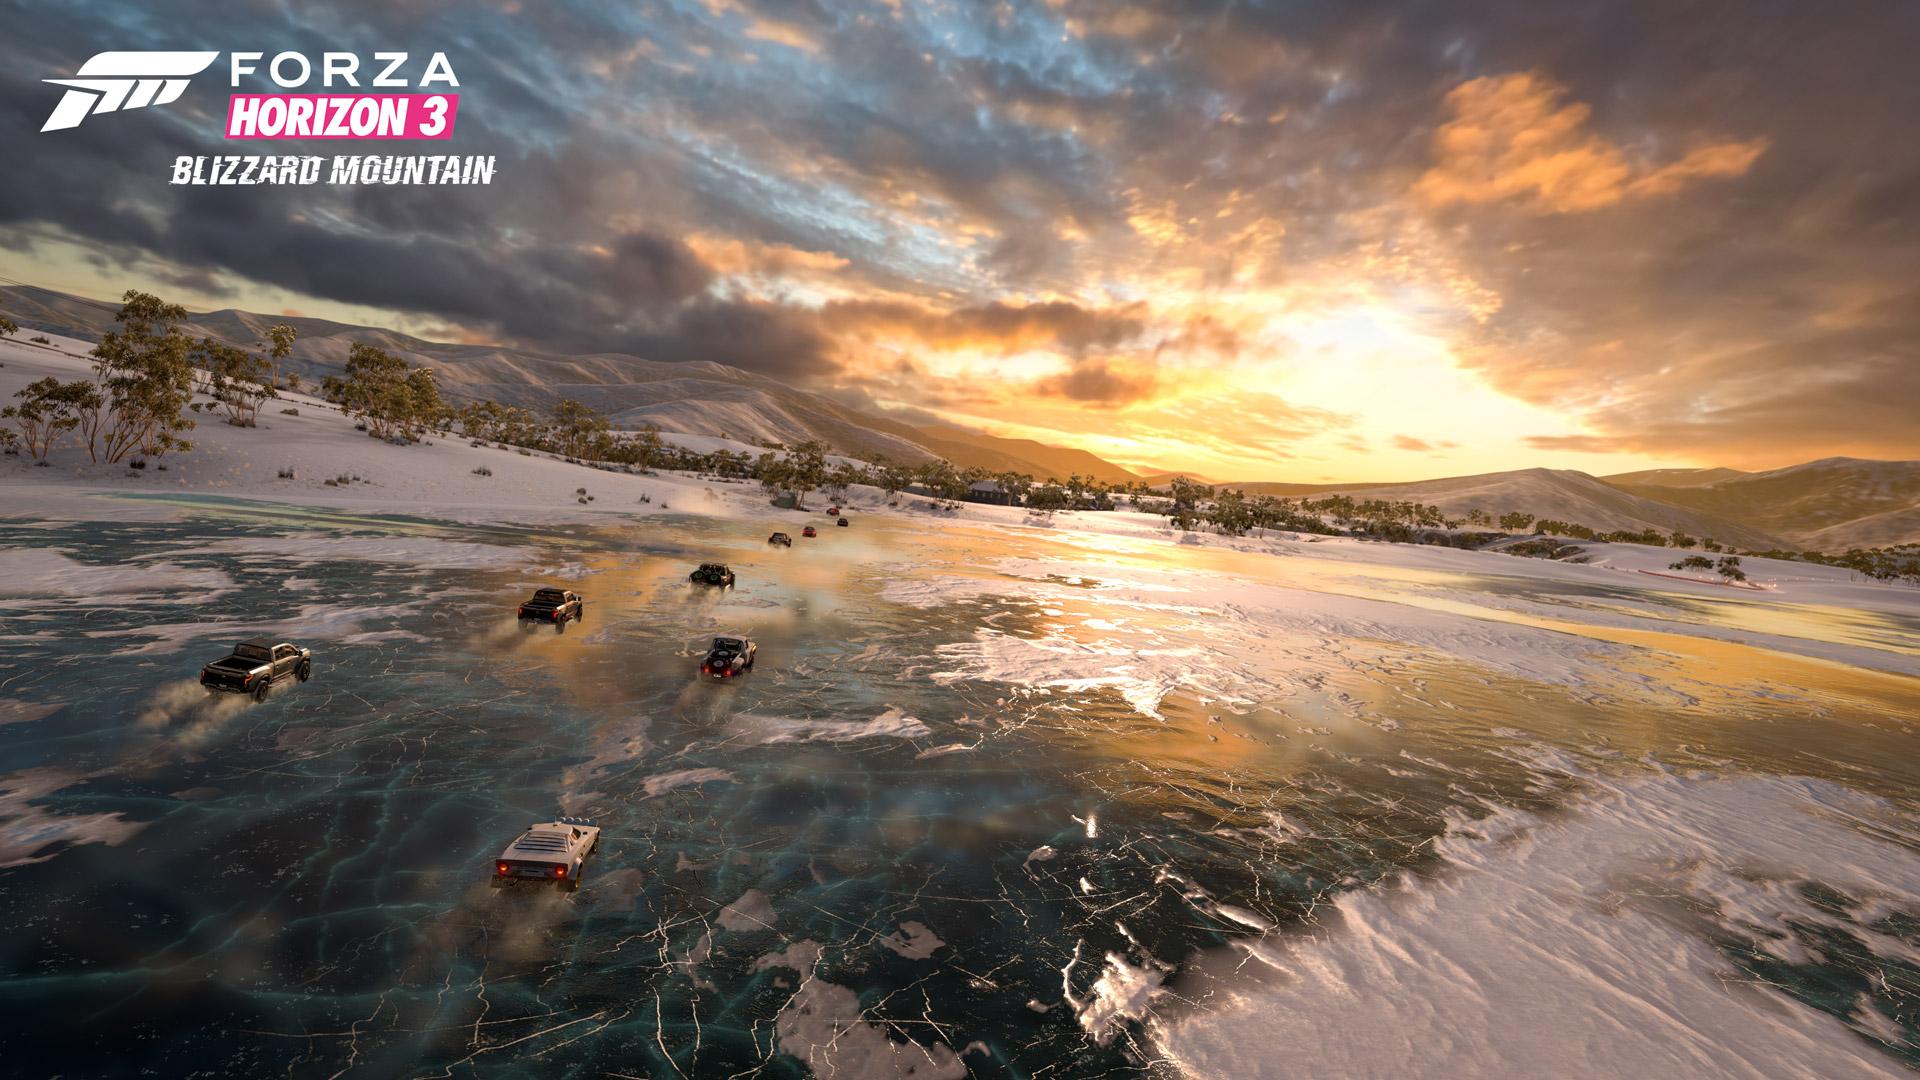 Forza Horizon 3 Wallpaper in 1920x1080